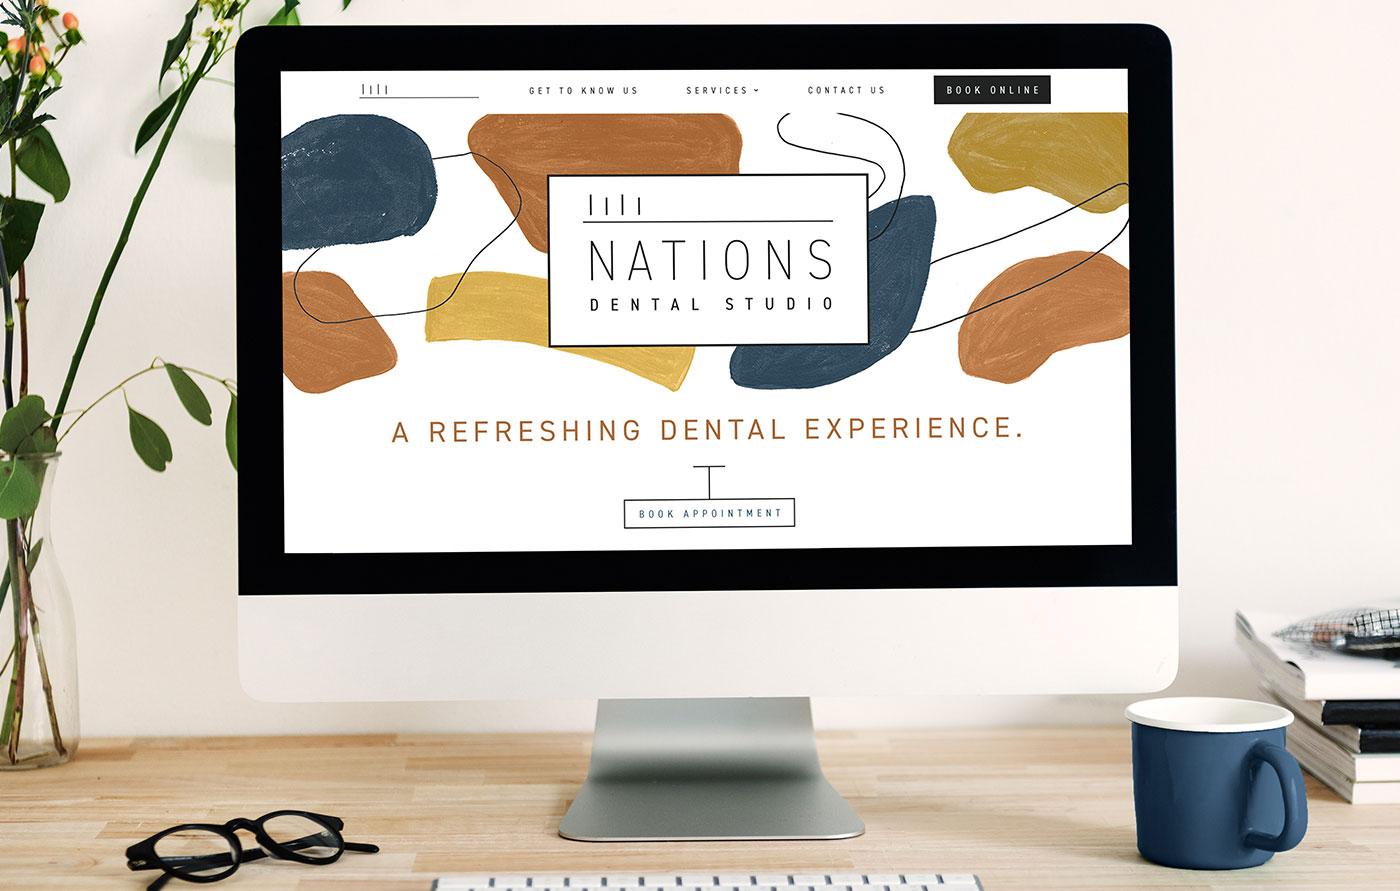 Minimalist UI Design for Nations Dental Studio